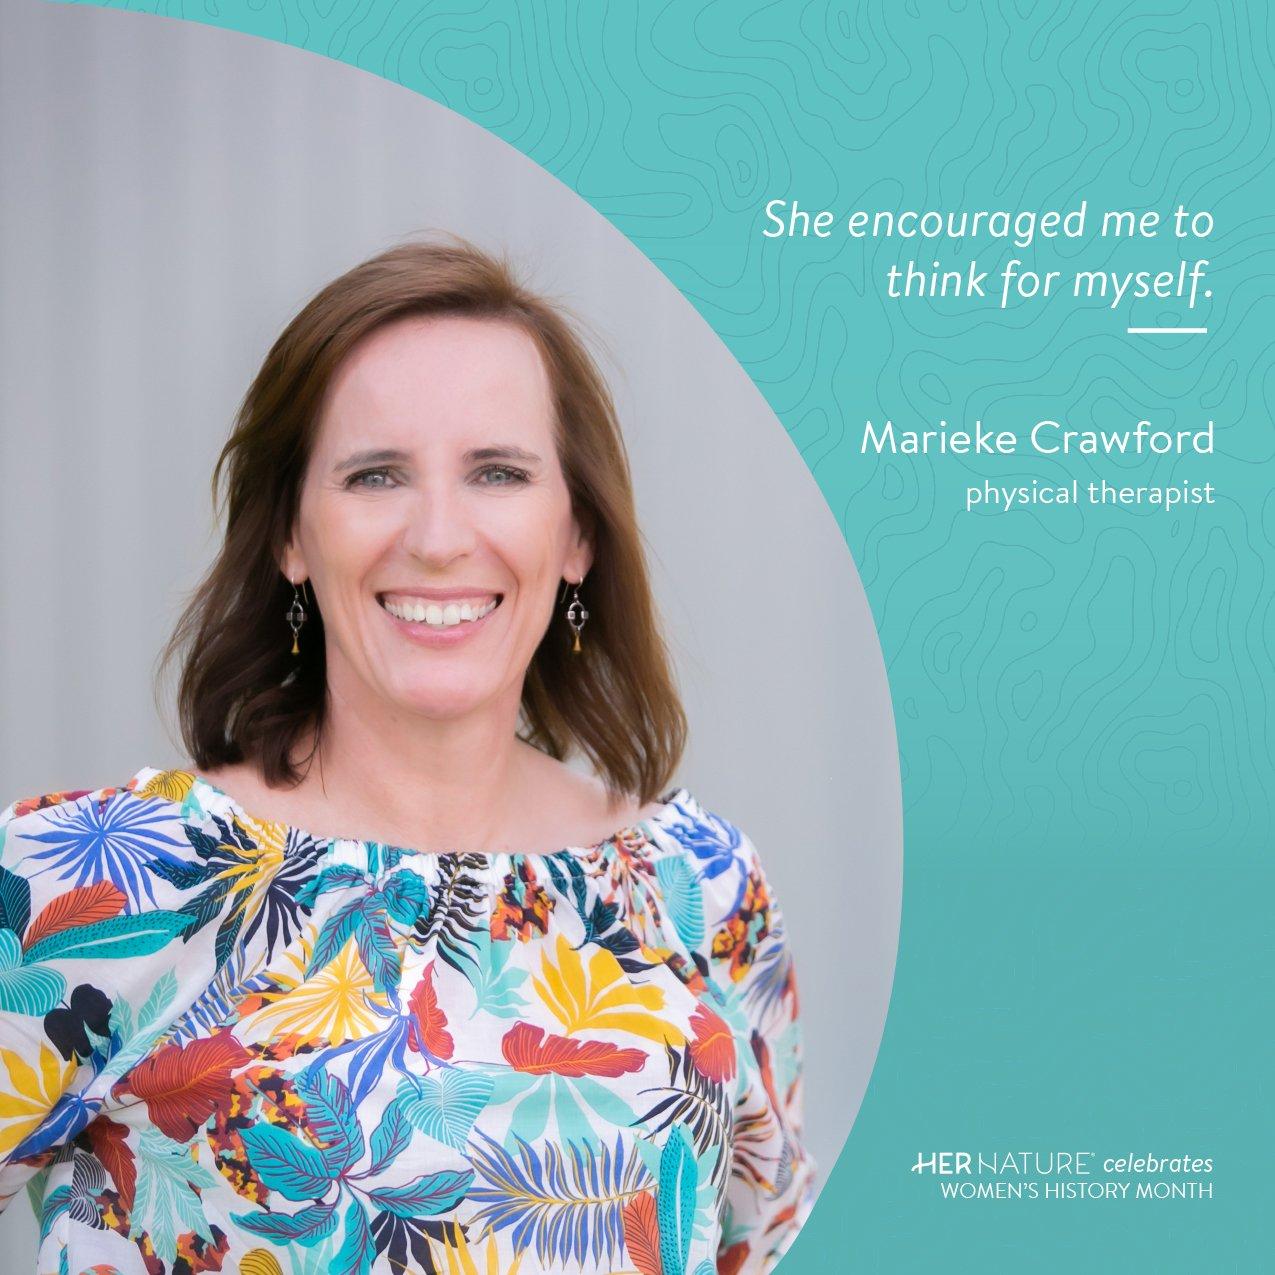 Marieke Crawford